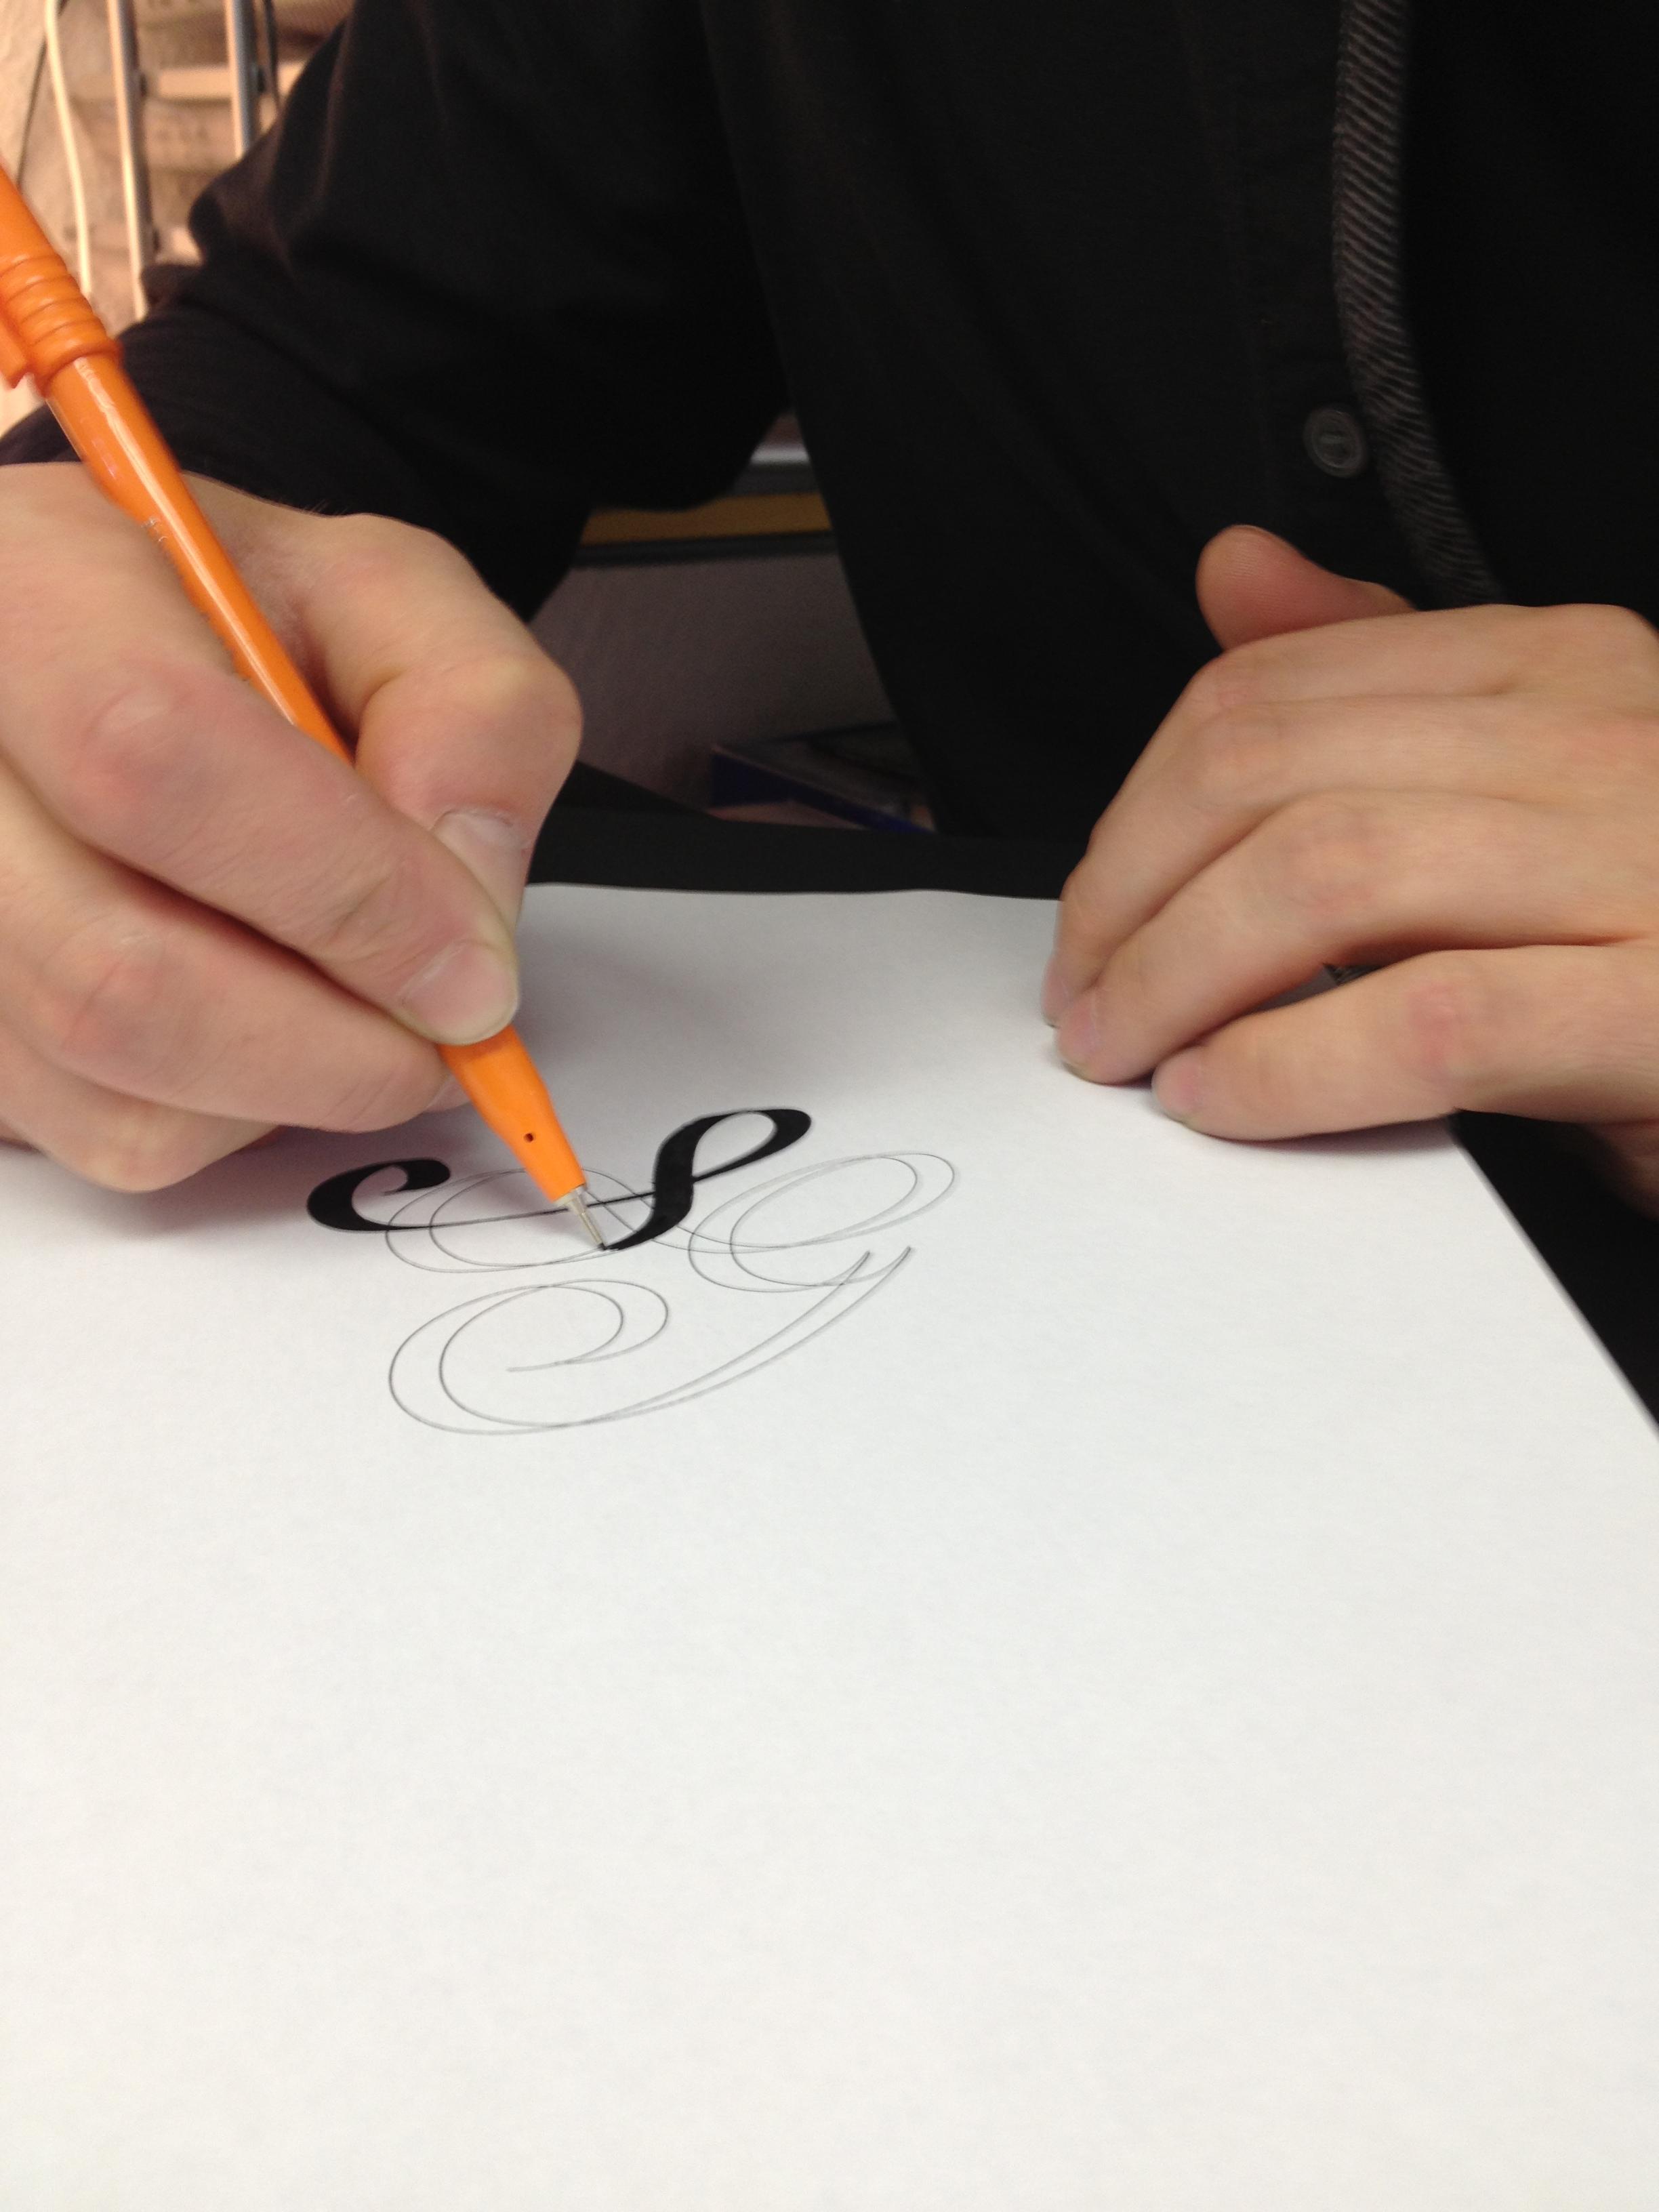 Sarah Gillmore sketches